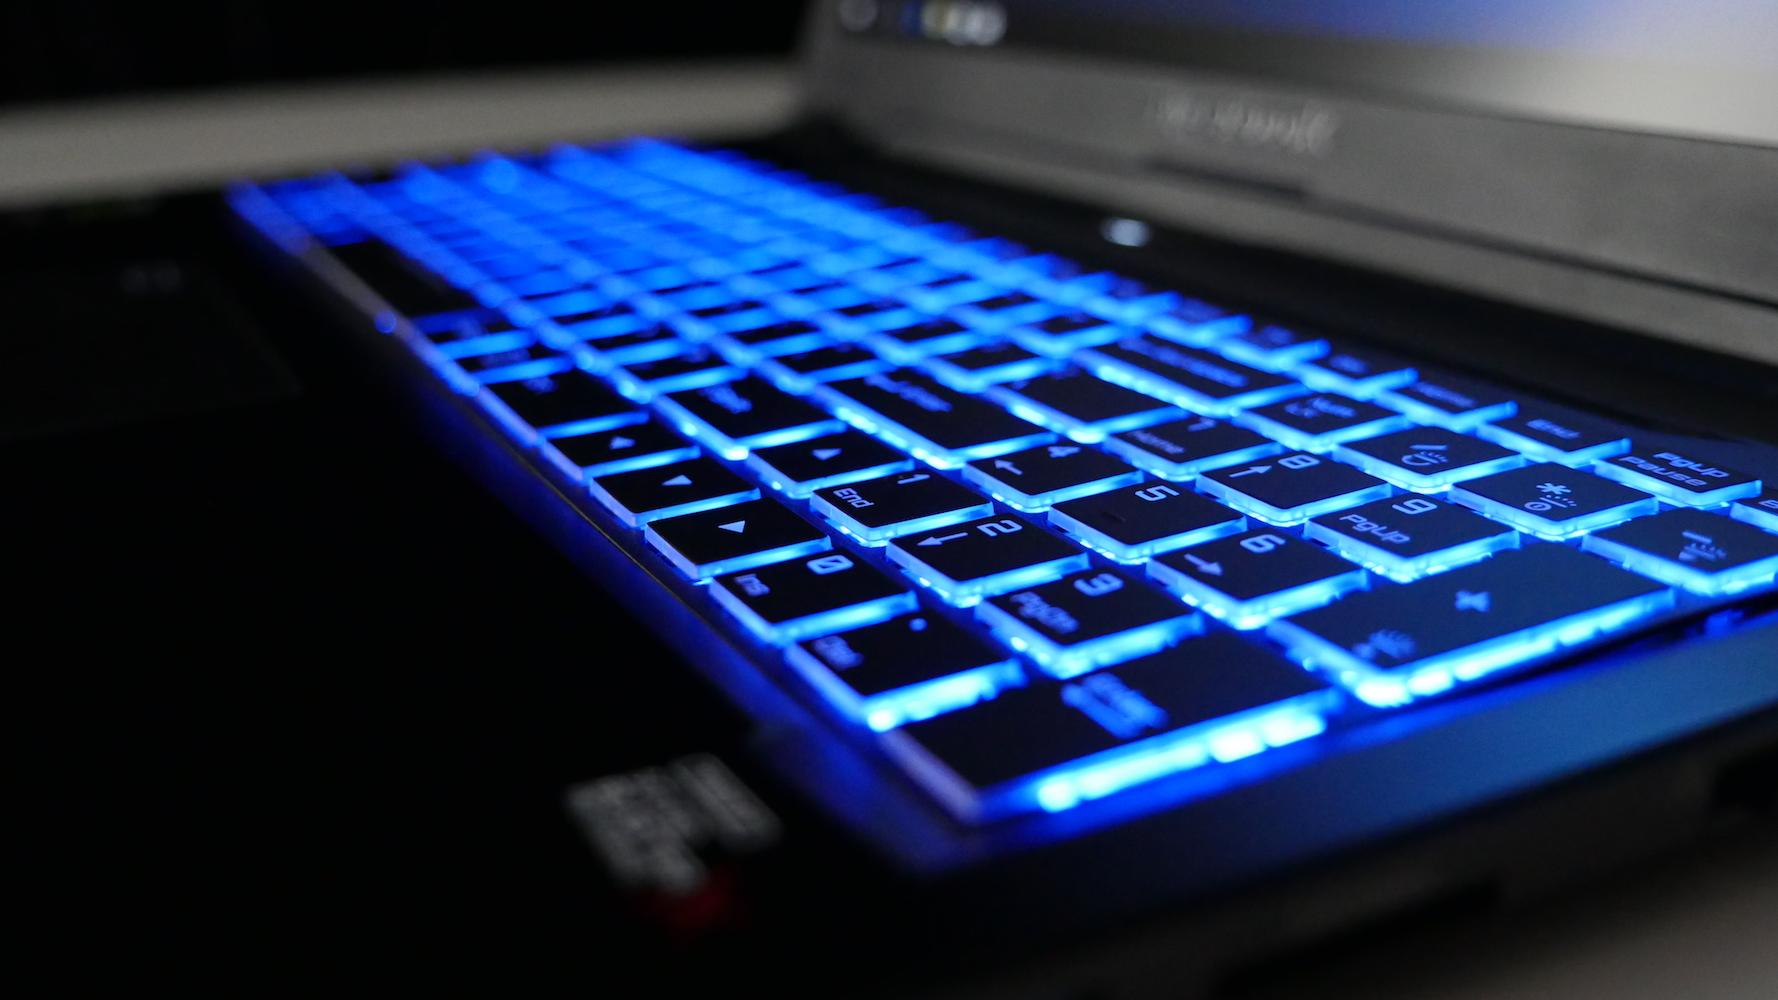 Hyperbook SL950VR - podświetlona klawiatura